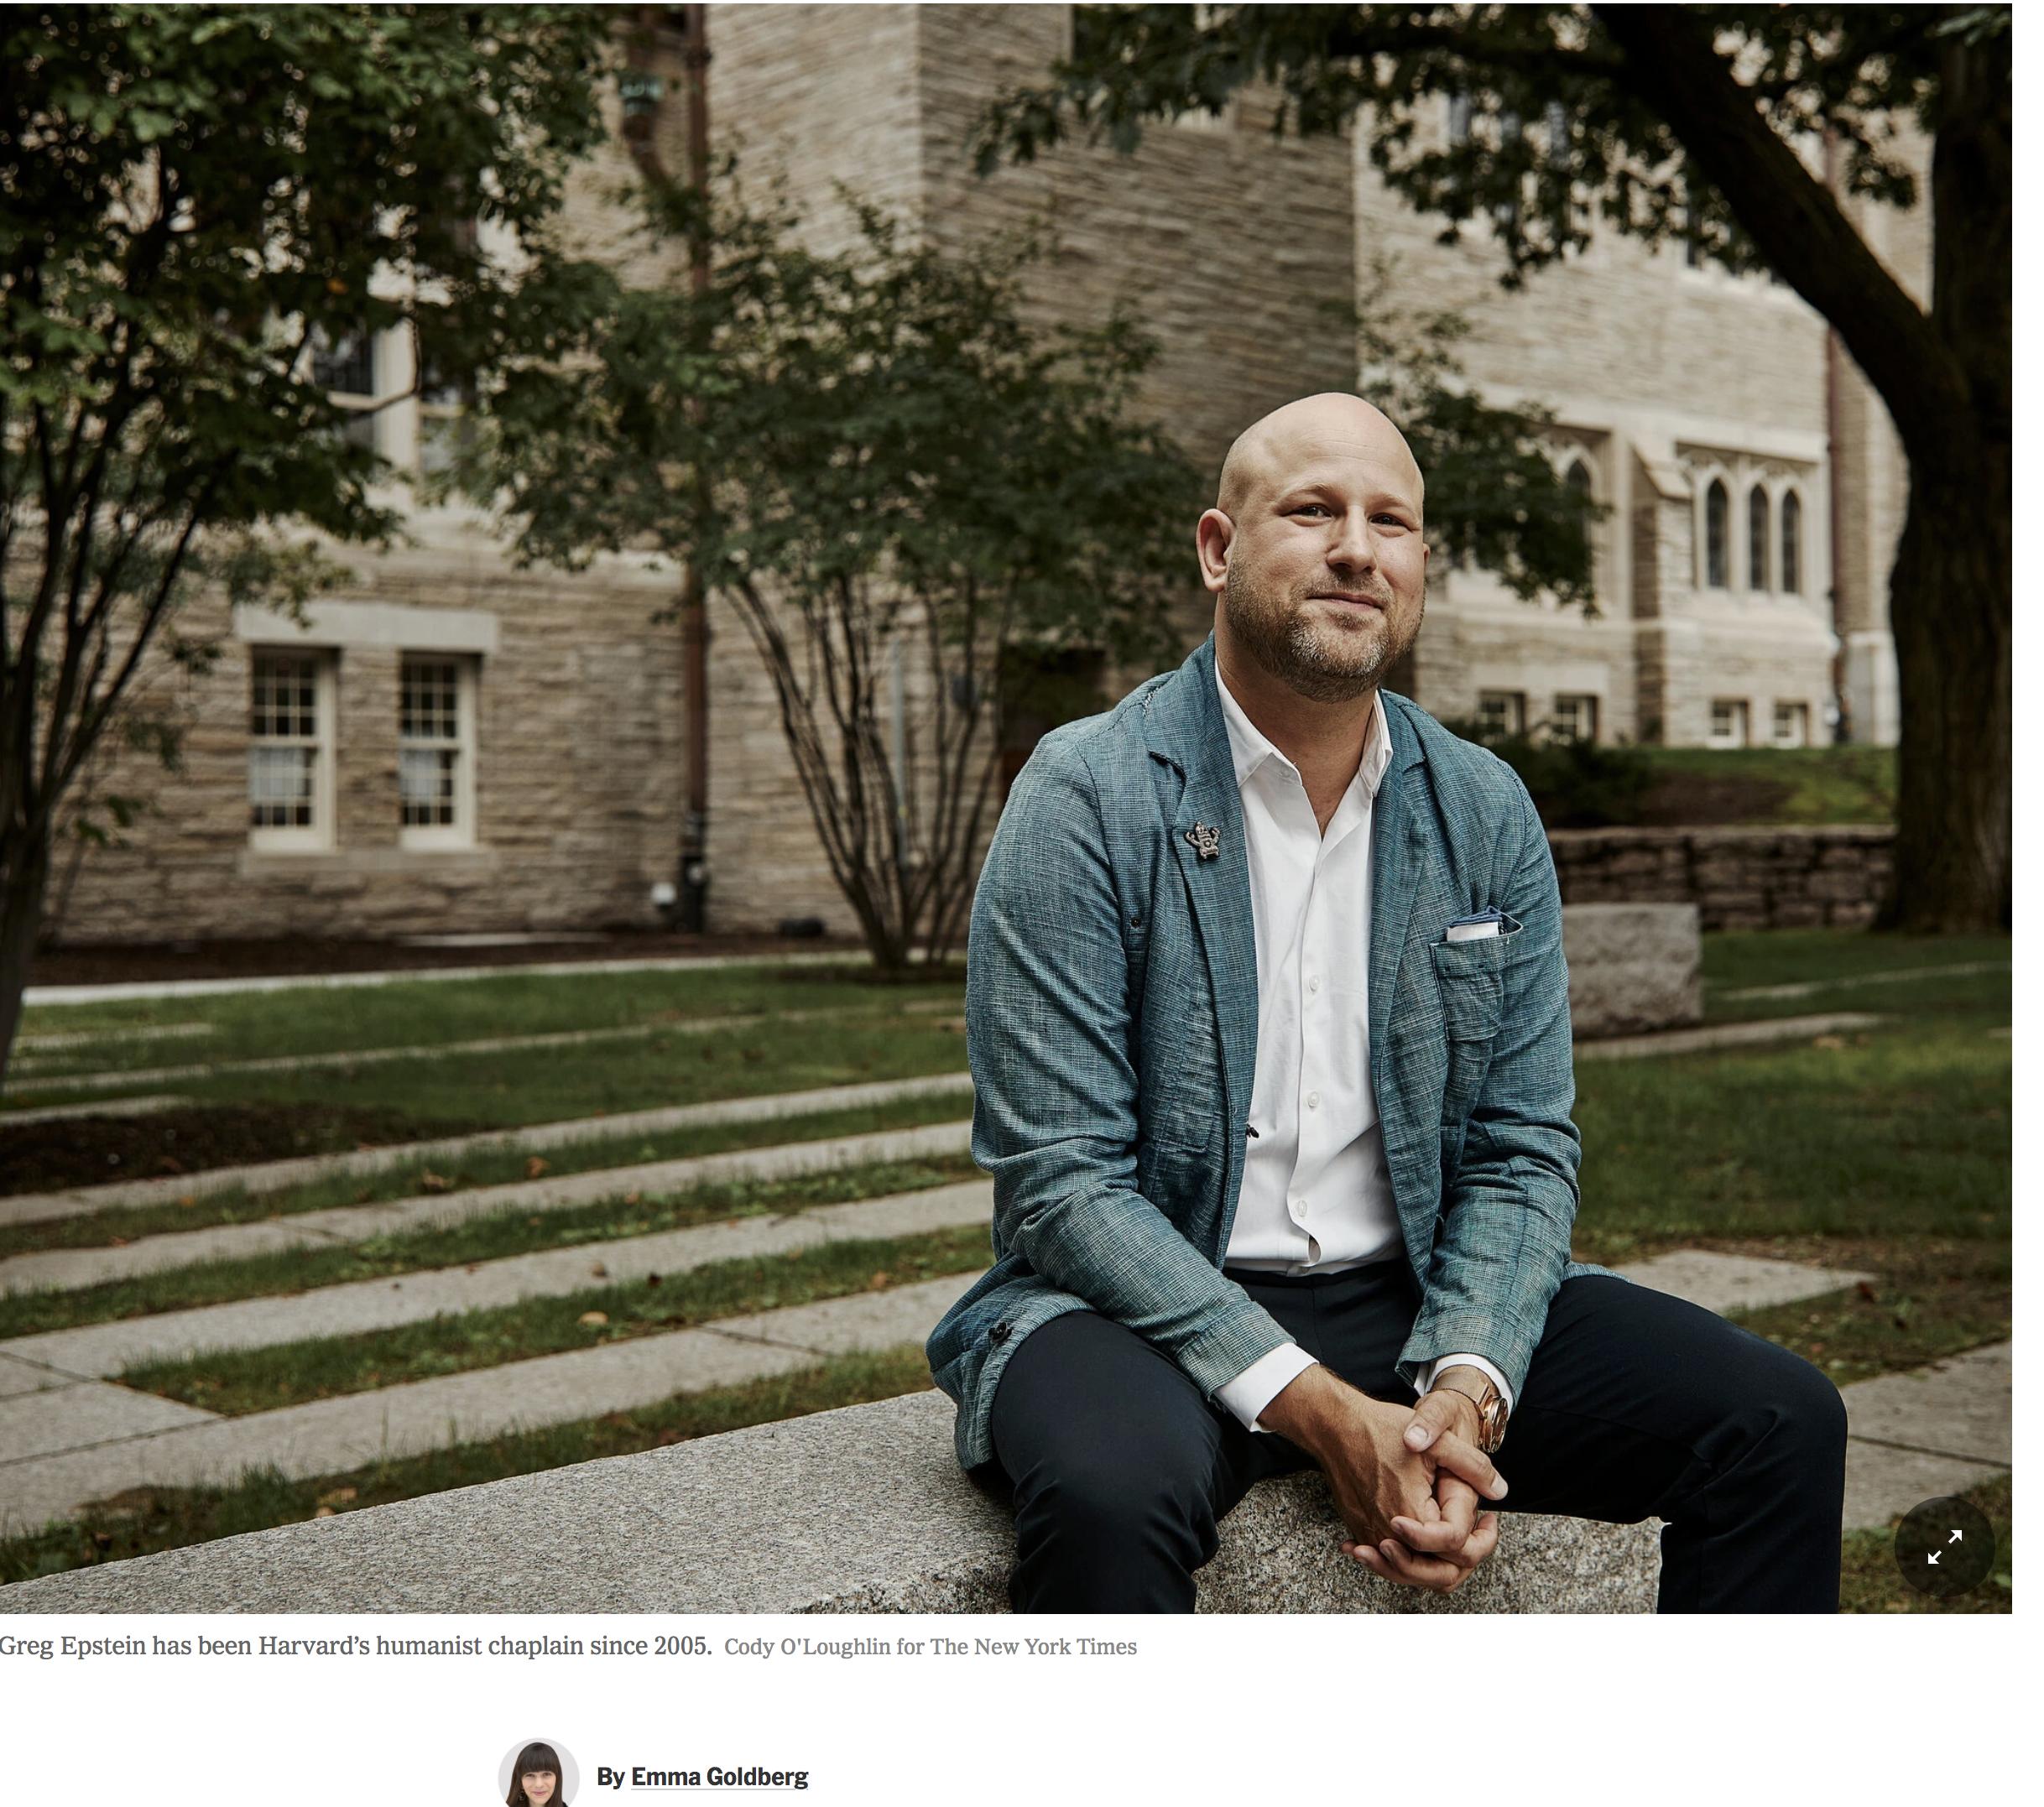 Harvard's head chaplain is now an atheist